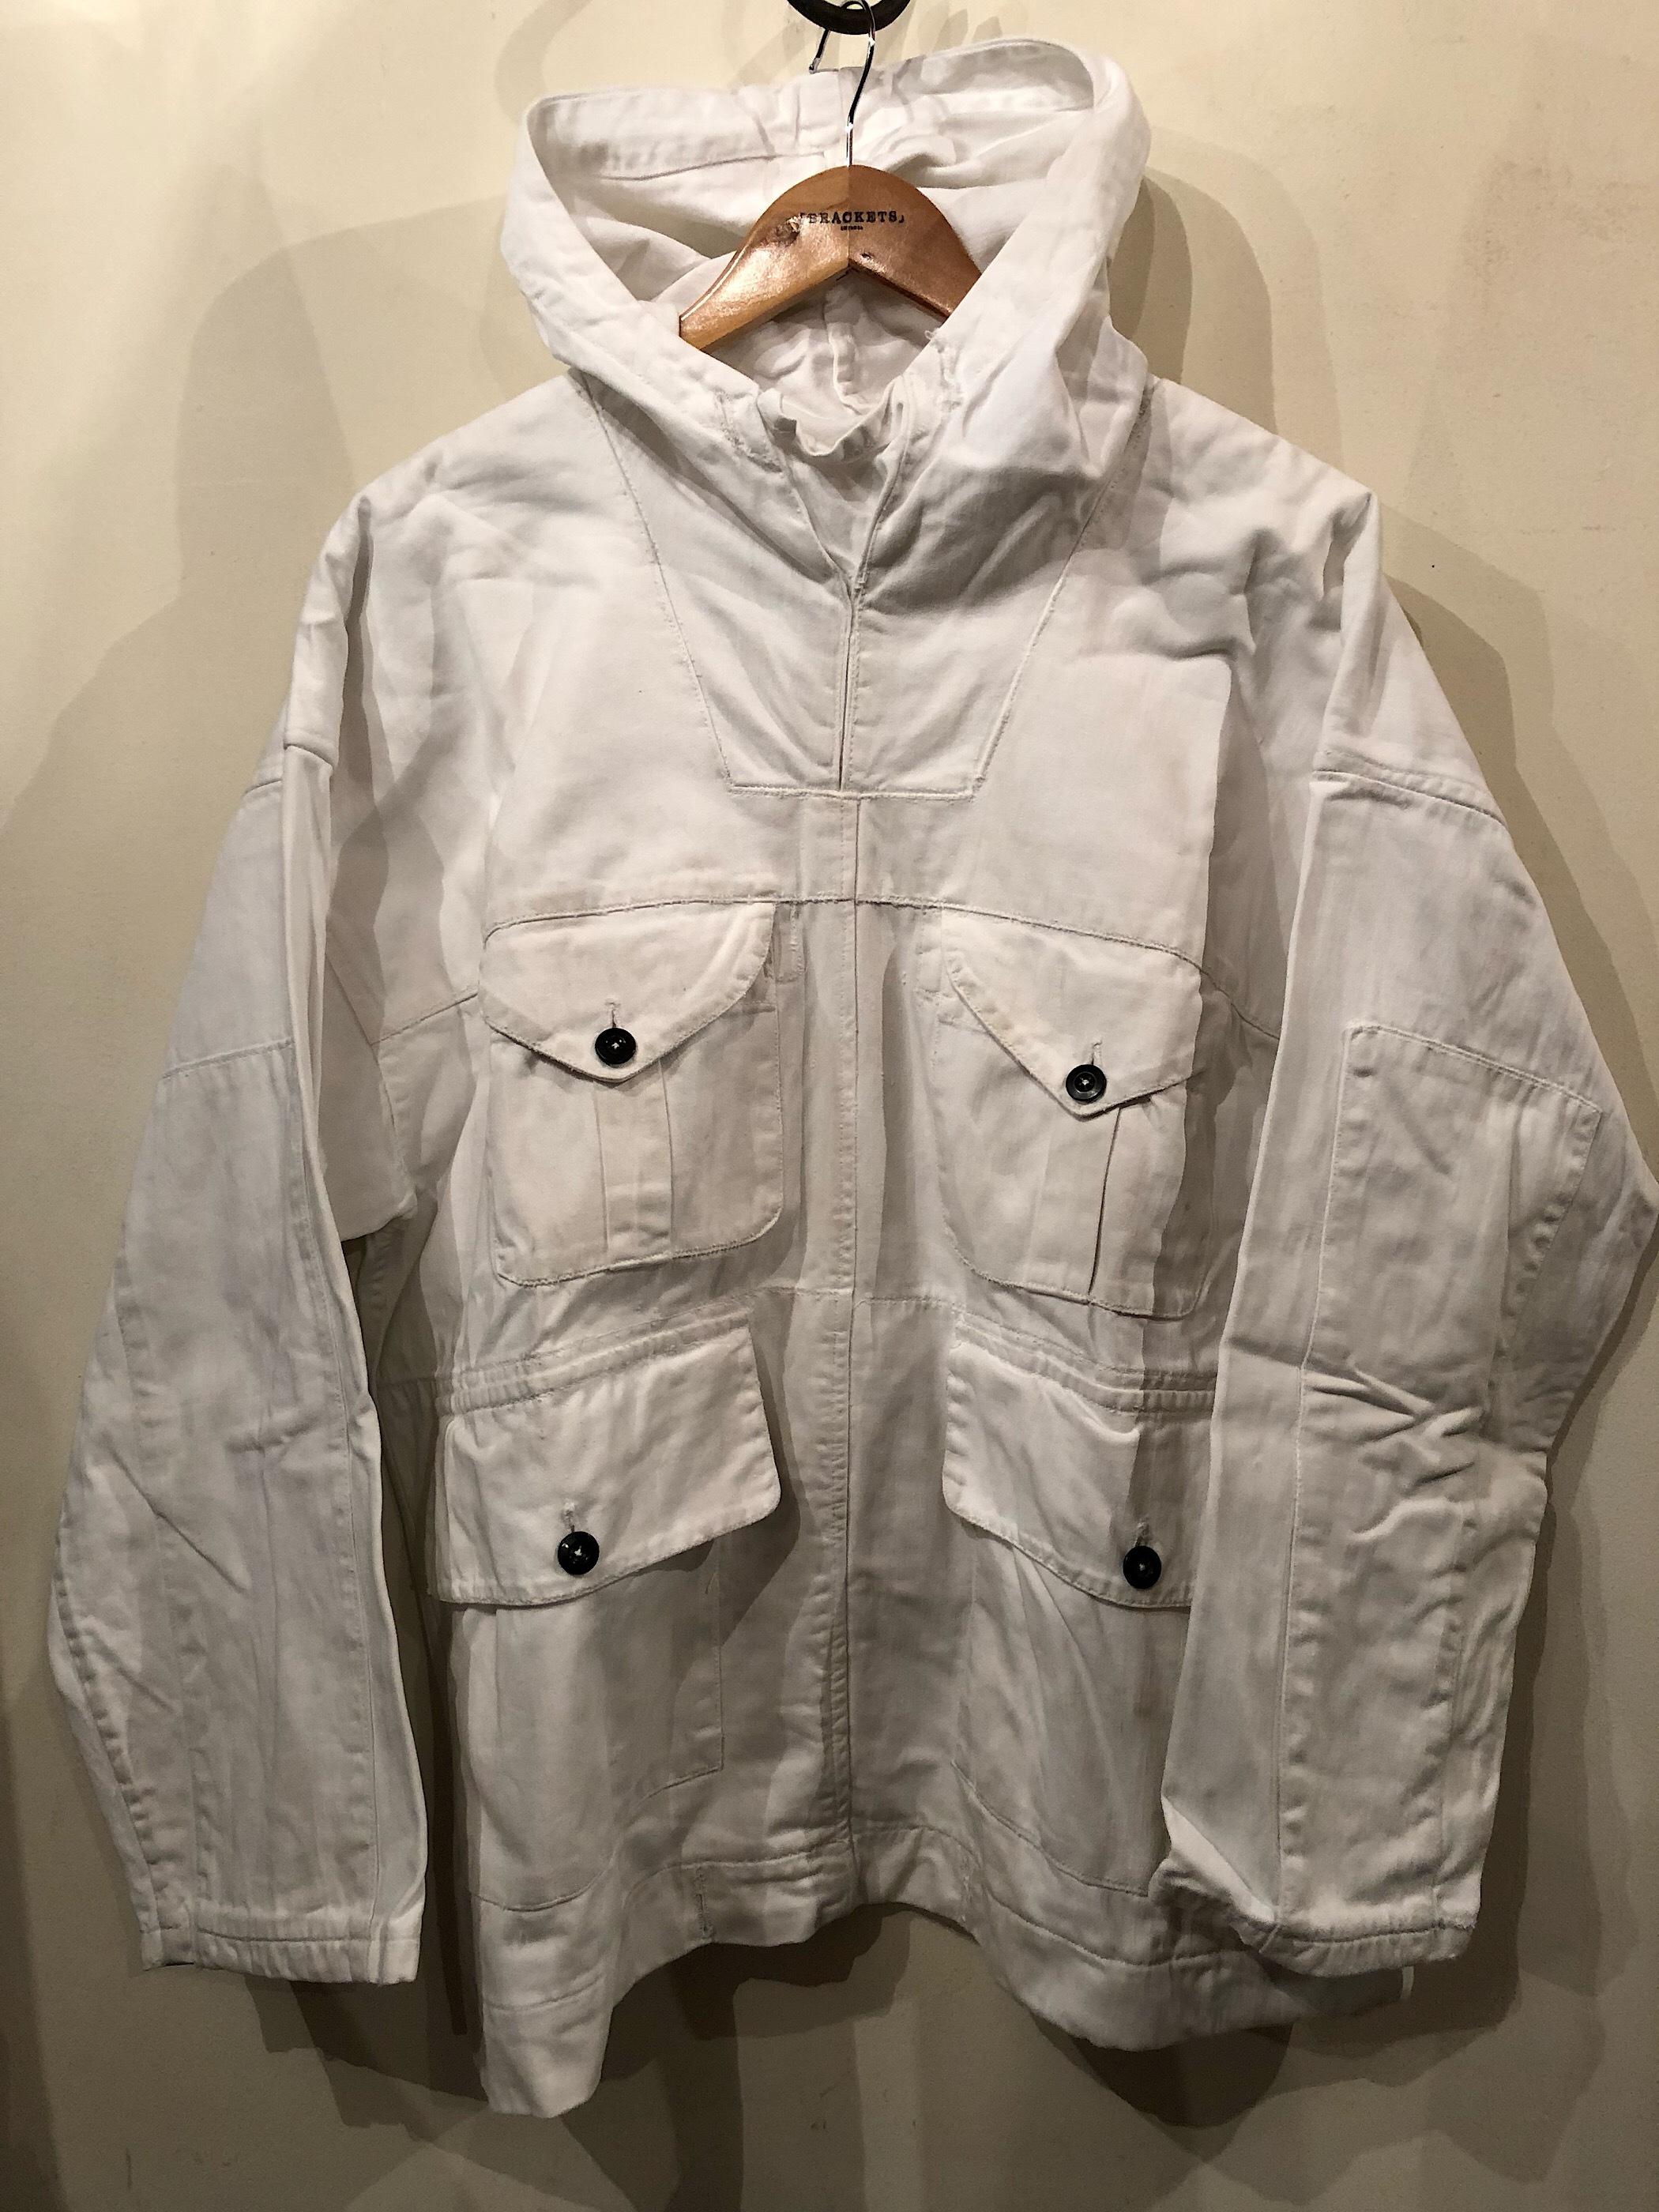 1940s Brirish SAS white cotton smock